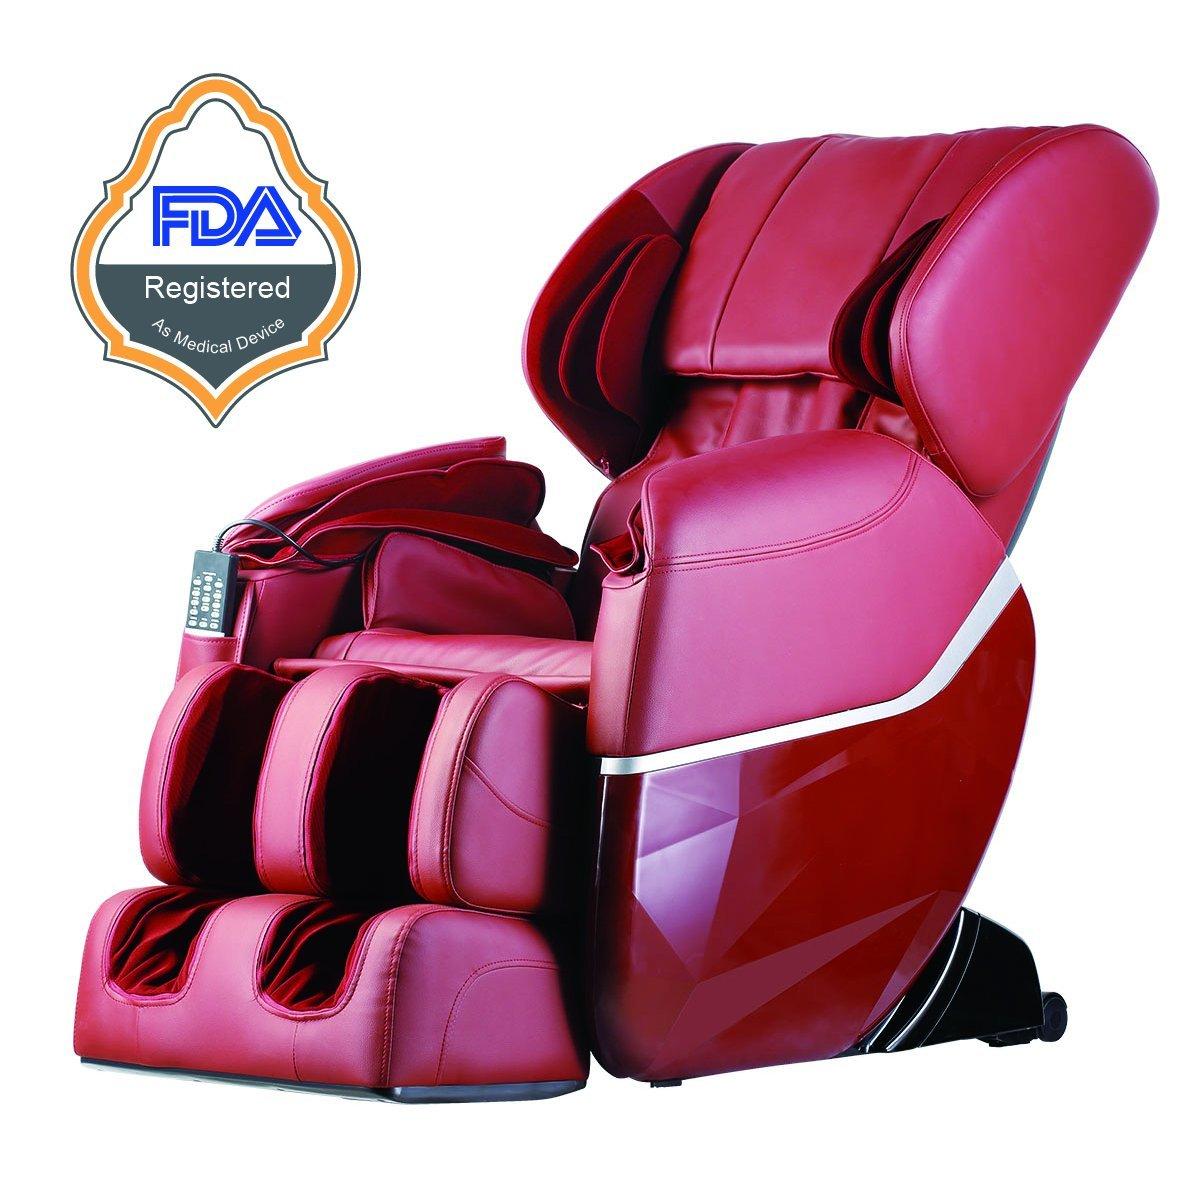 New Electric Full Body Shiatsu Massage Chair Recliner Zero